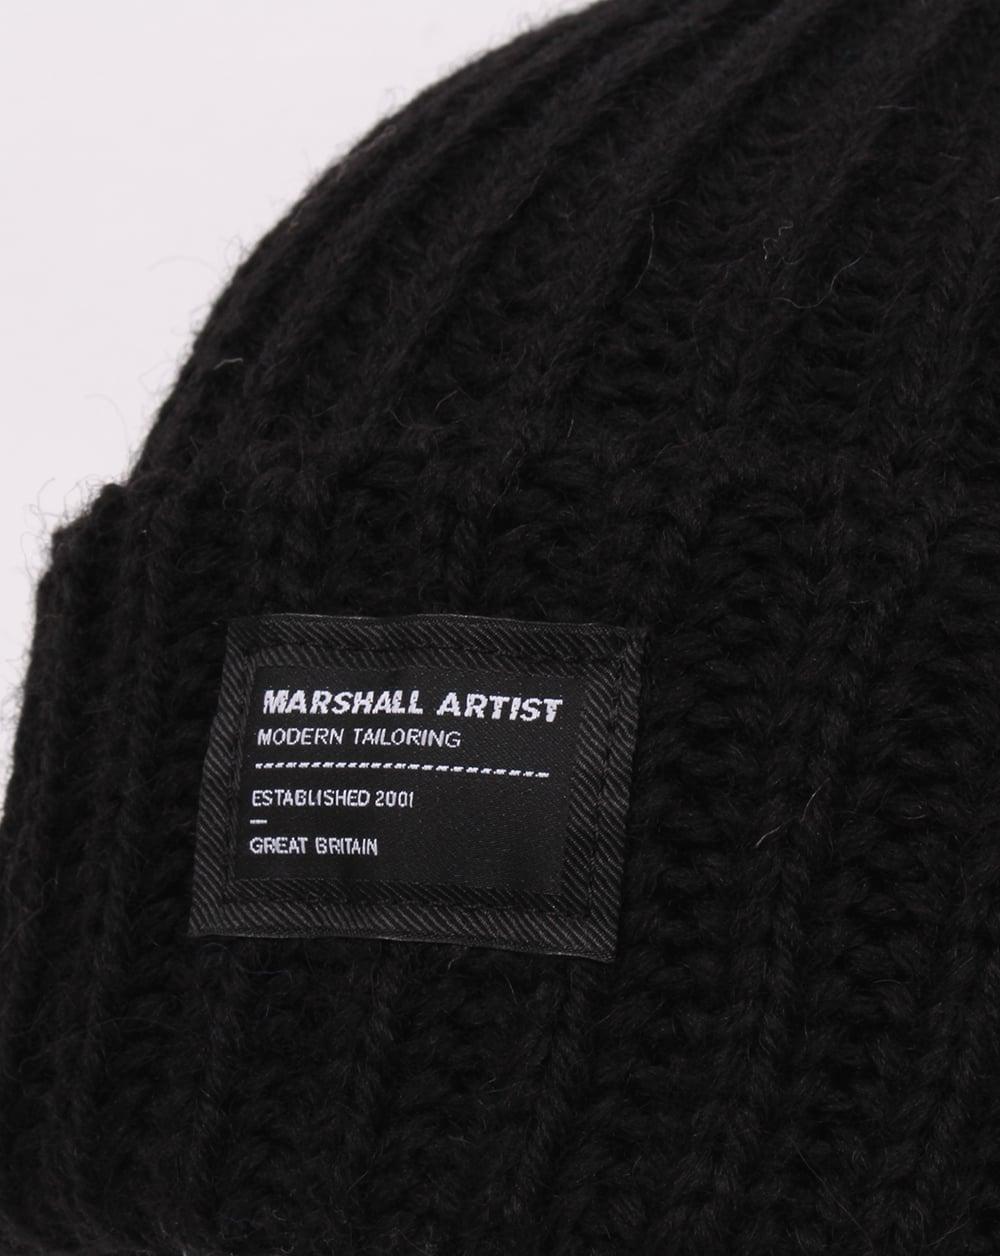 Marshall Artist Made In England Wool Beanie Black 8f0a639cb6a